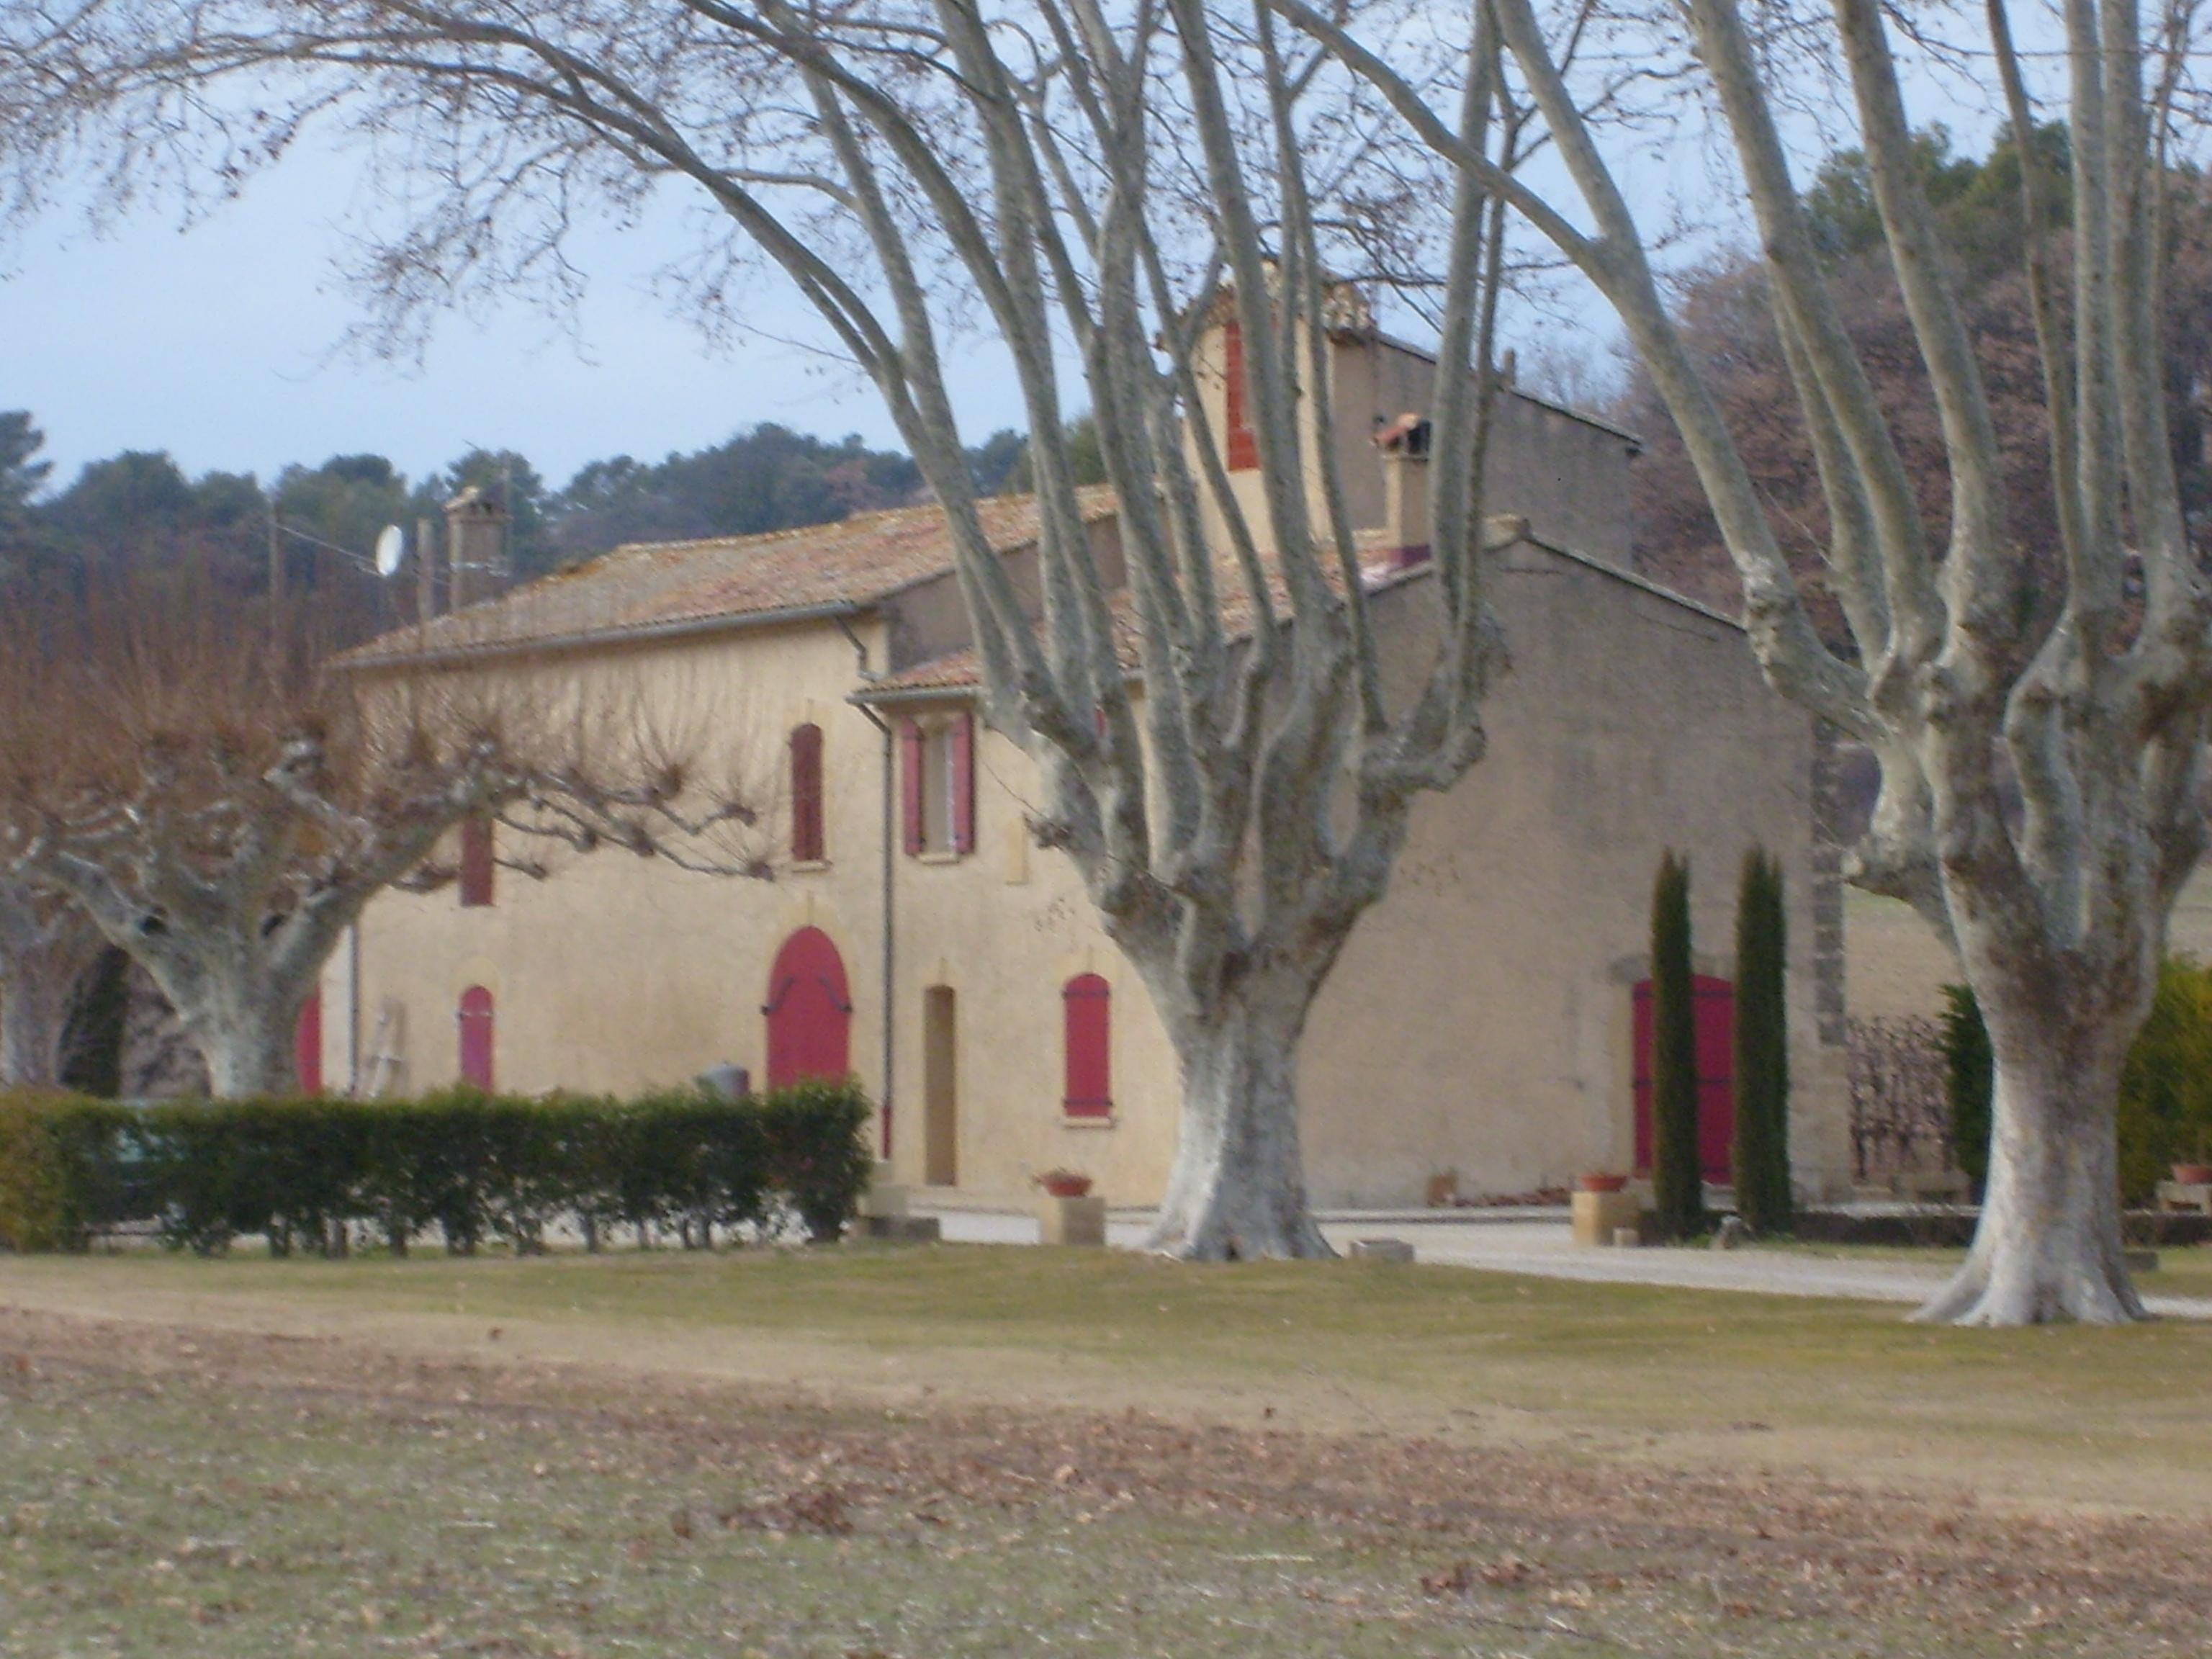 Plan De Maison Mas De Provence mas (provençal farmhouse) - wikipedia